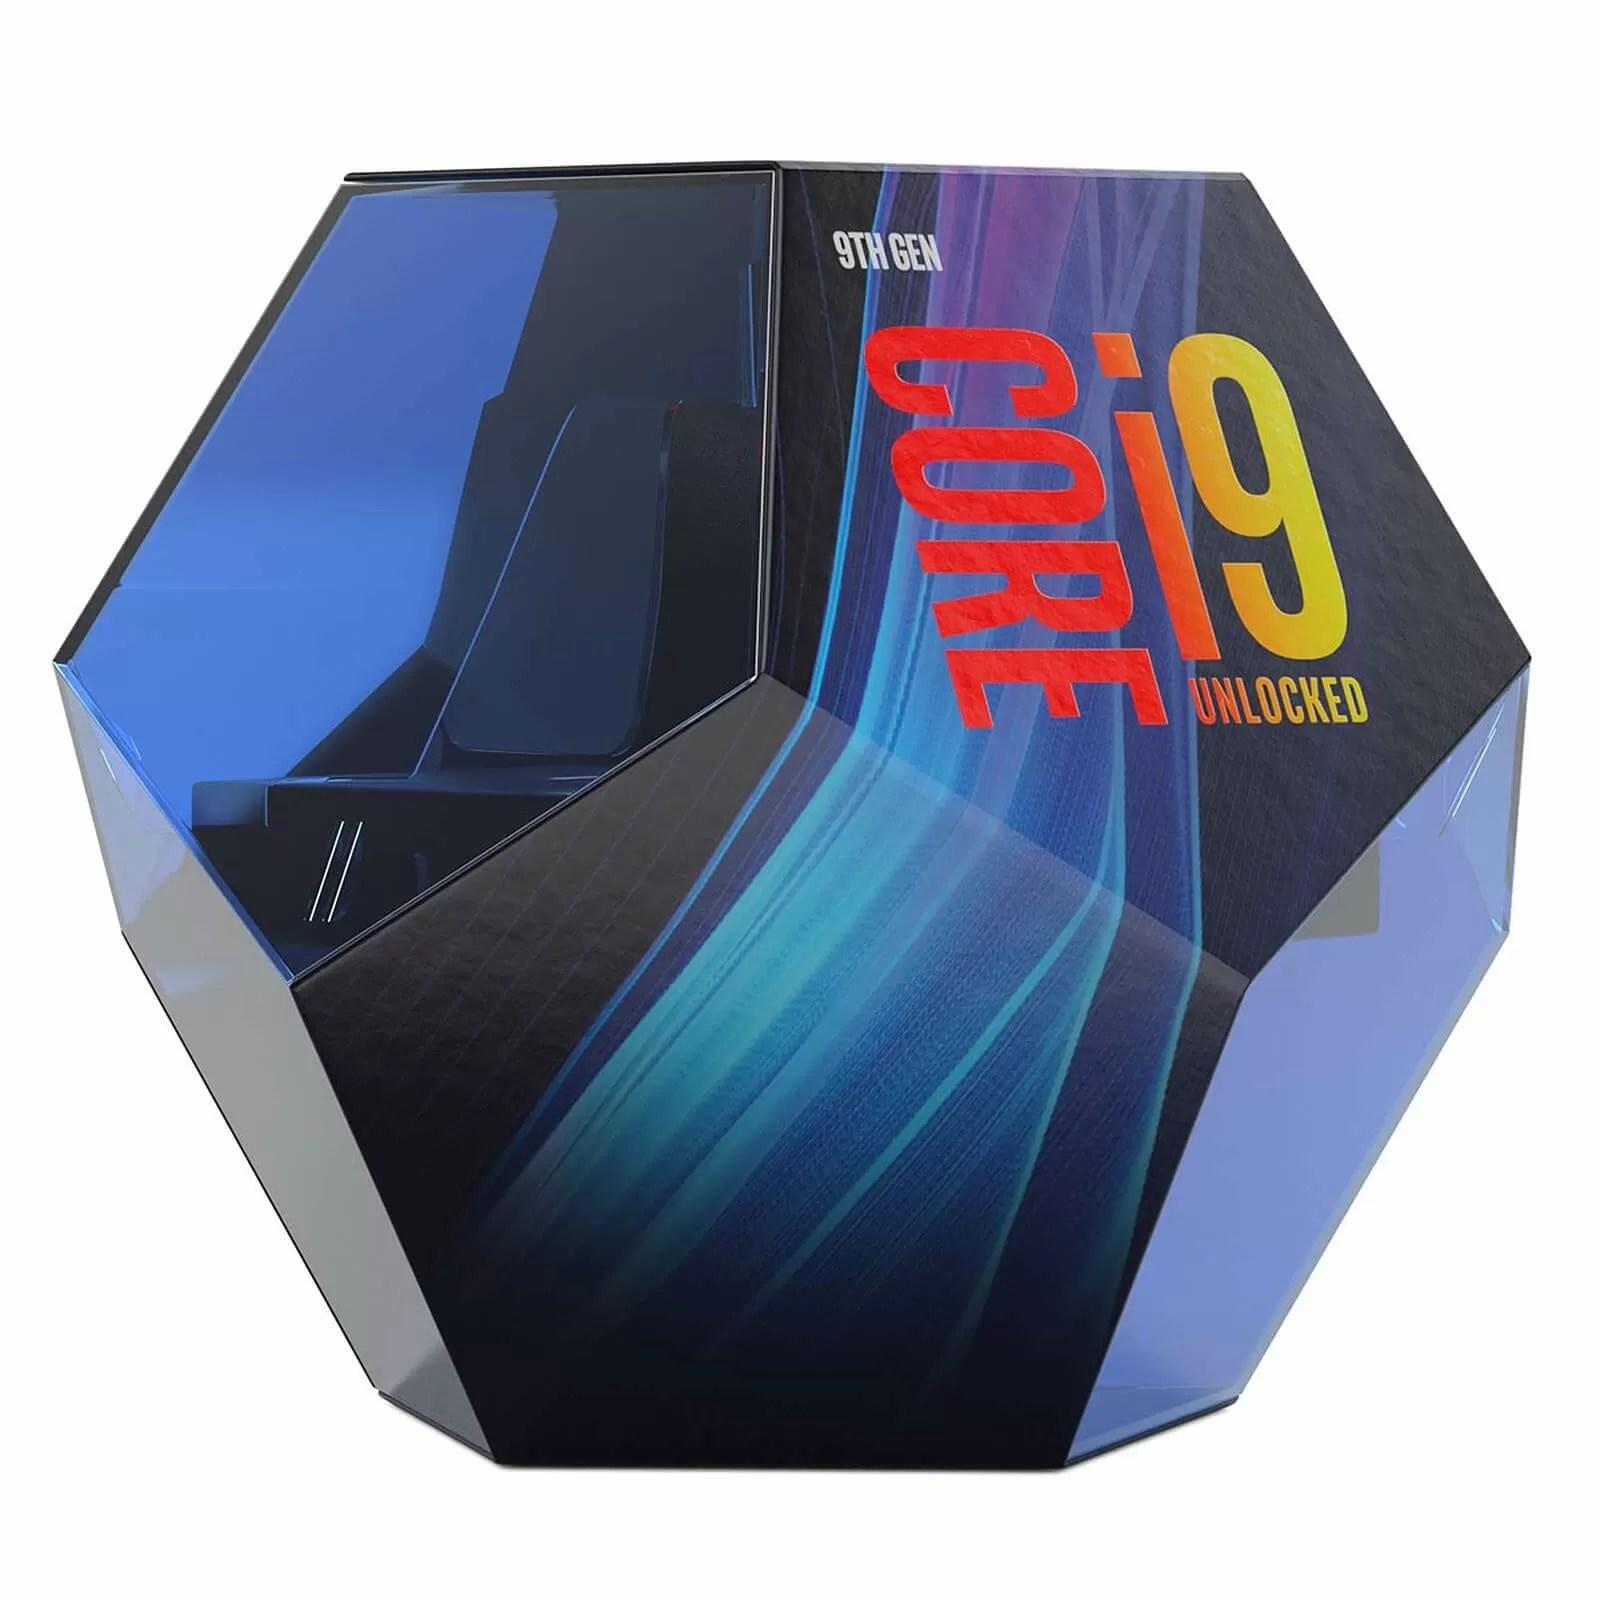 Intel Core i9 9900K Reviews - TechSpot